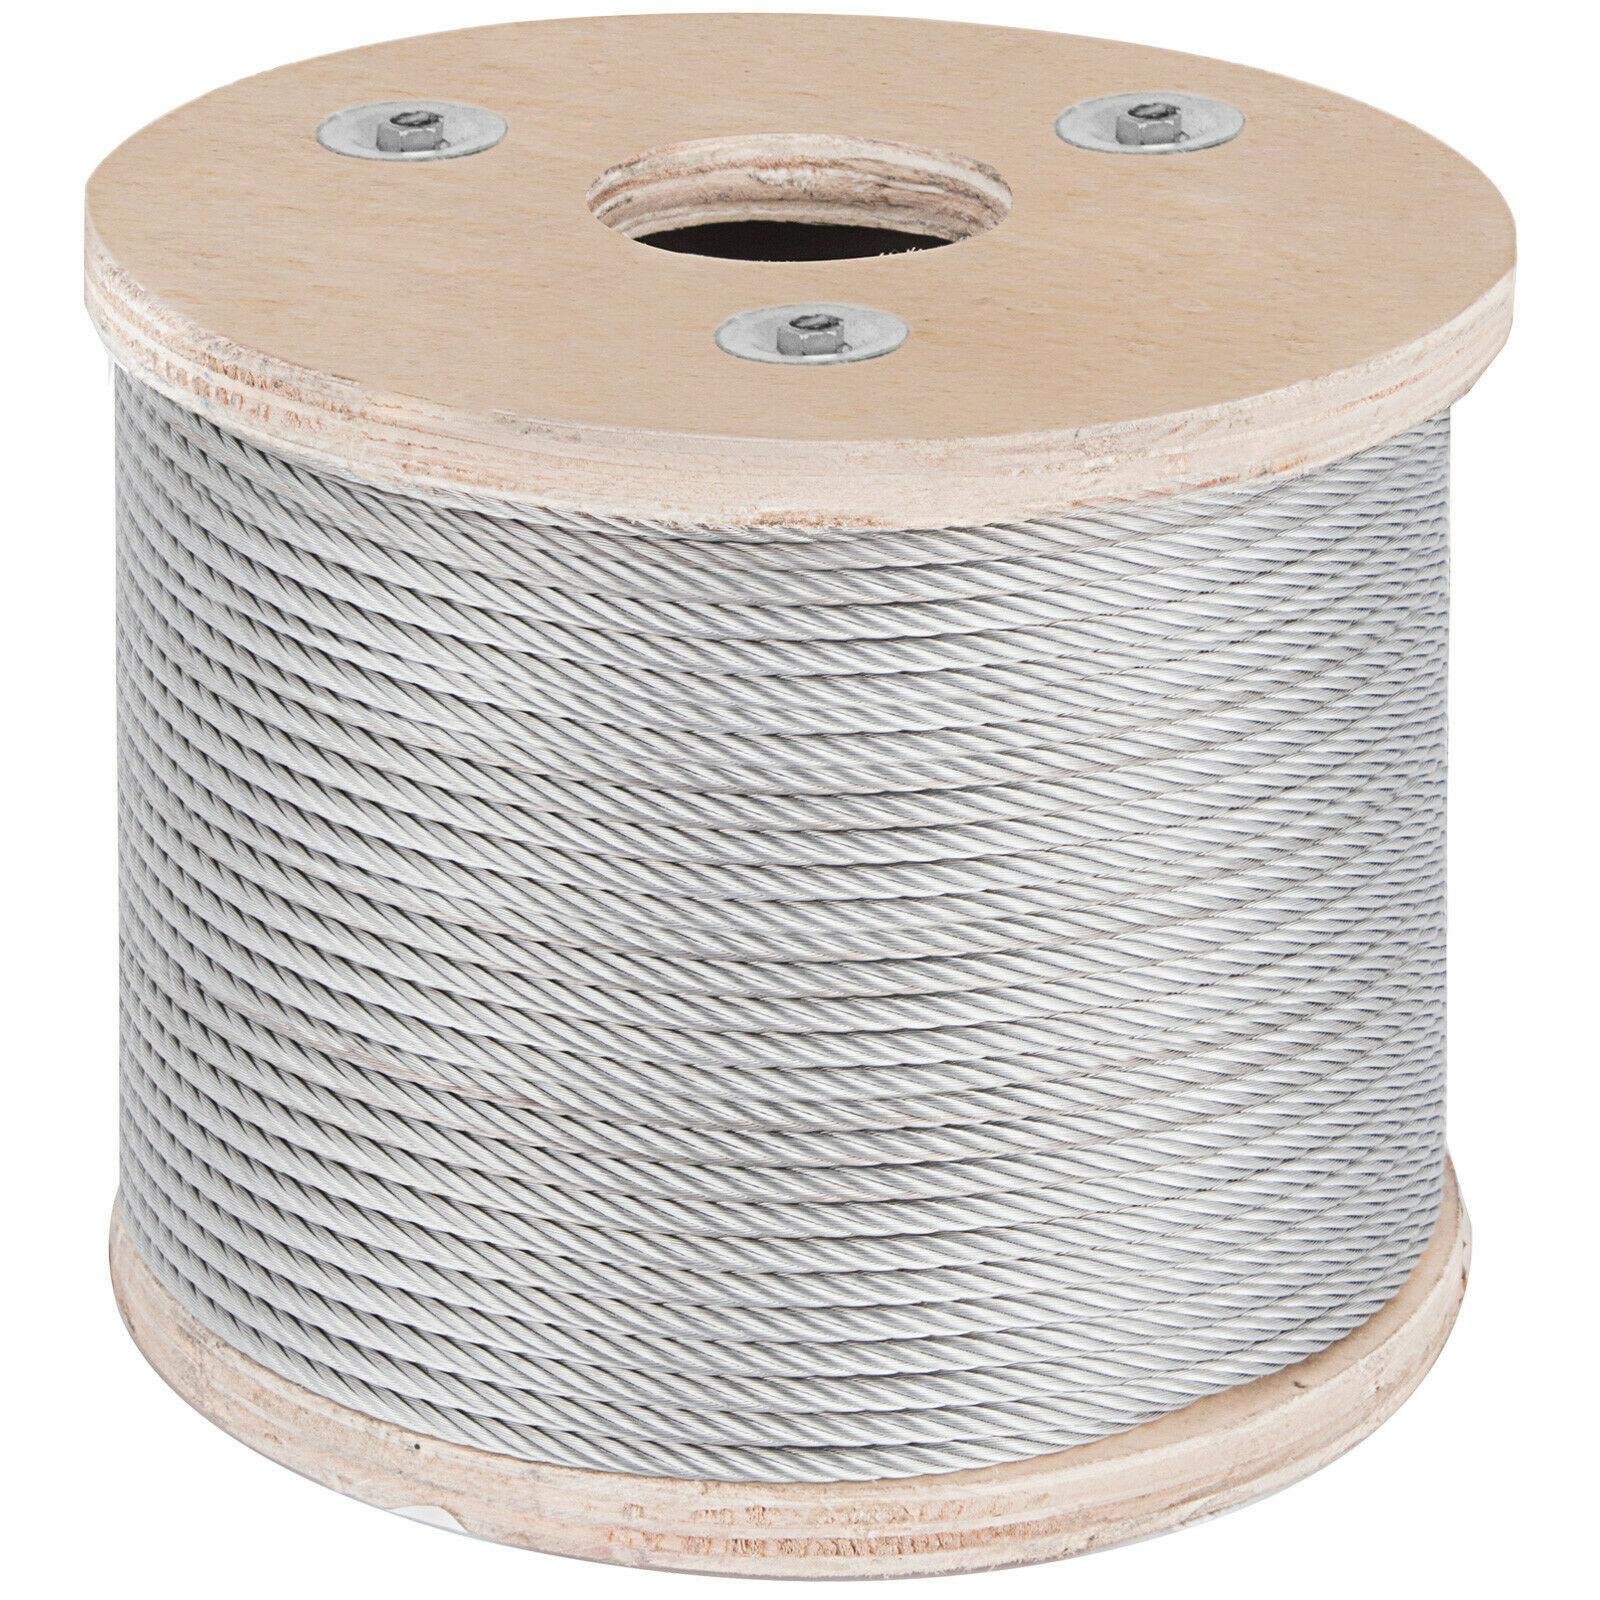 VEVOR 304 Cable de acero inoxidable 3/16 pulgadas 7X19 Cable de acero para barandilla DIY balaustrada